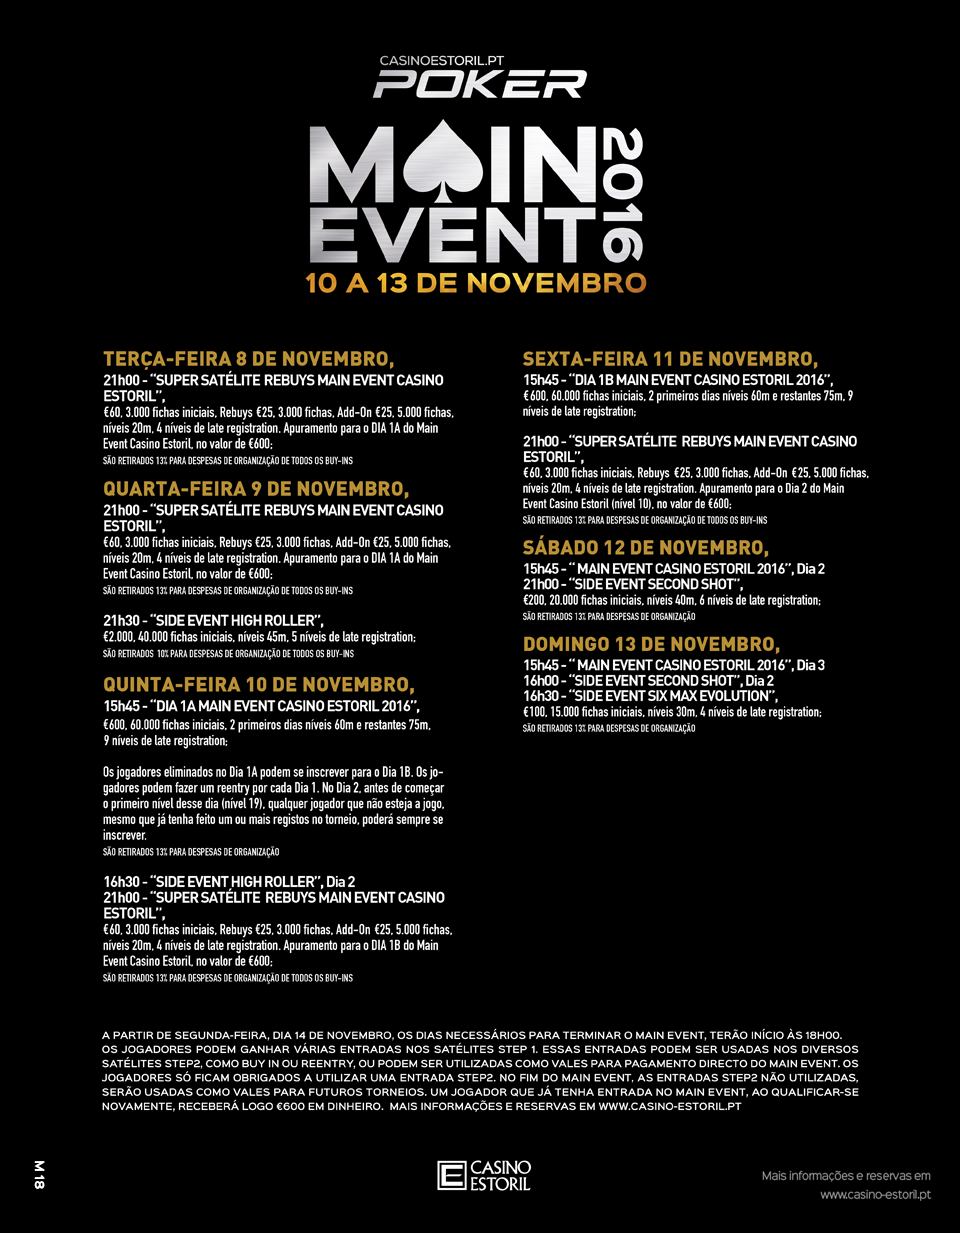 Satélites Main Event Casino Estoril 3 a 6 de Novembro 101